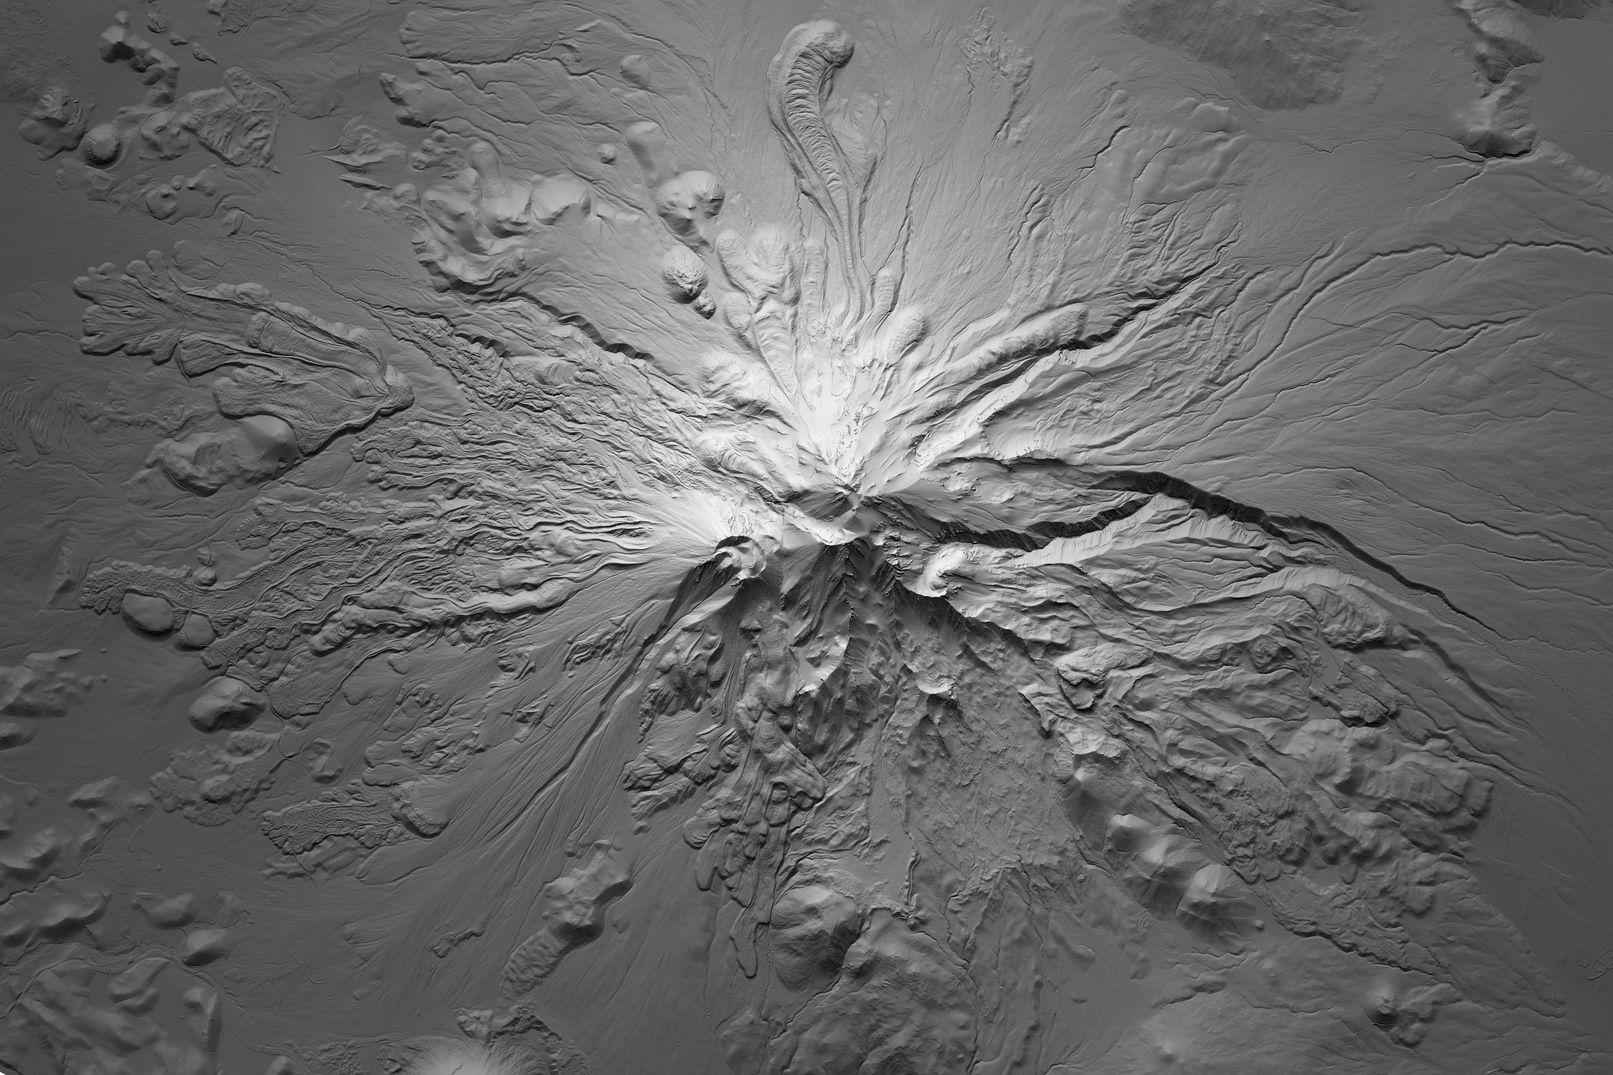 Map of Mount Shasta